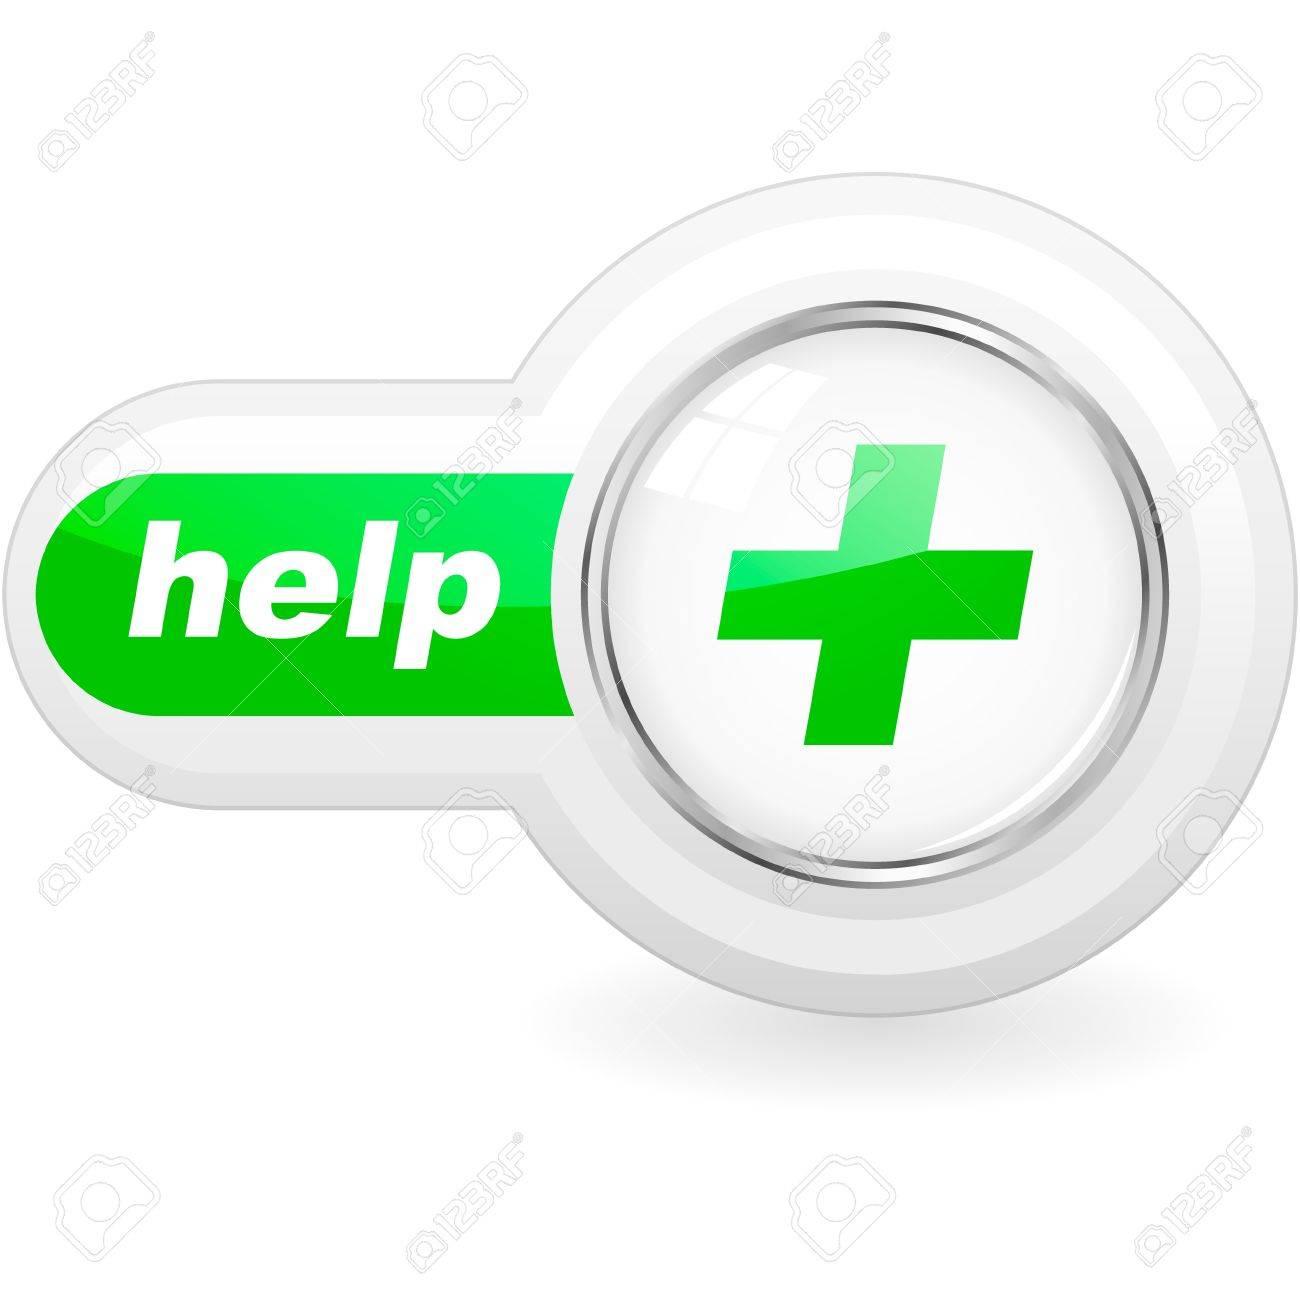 Help button for web. Stock Vector - 11256901